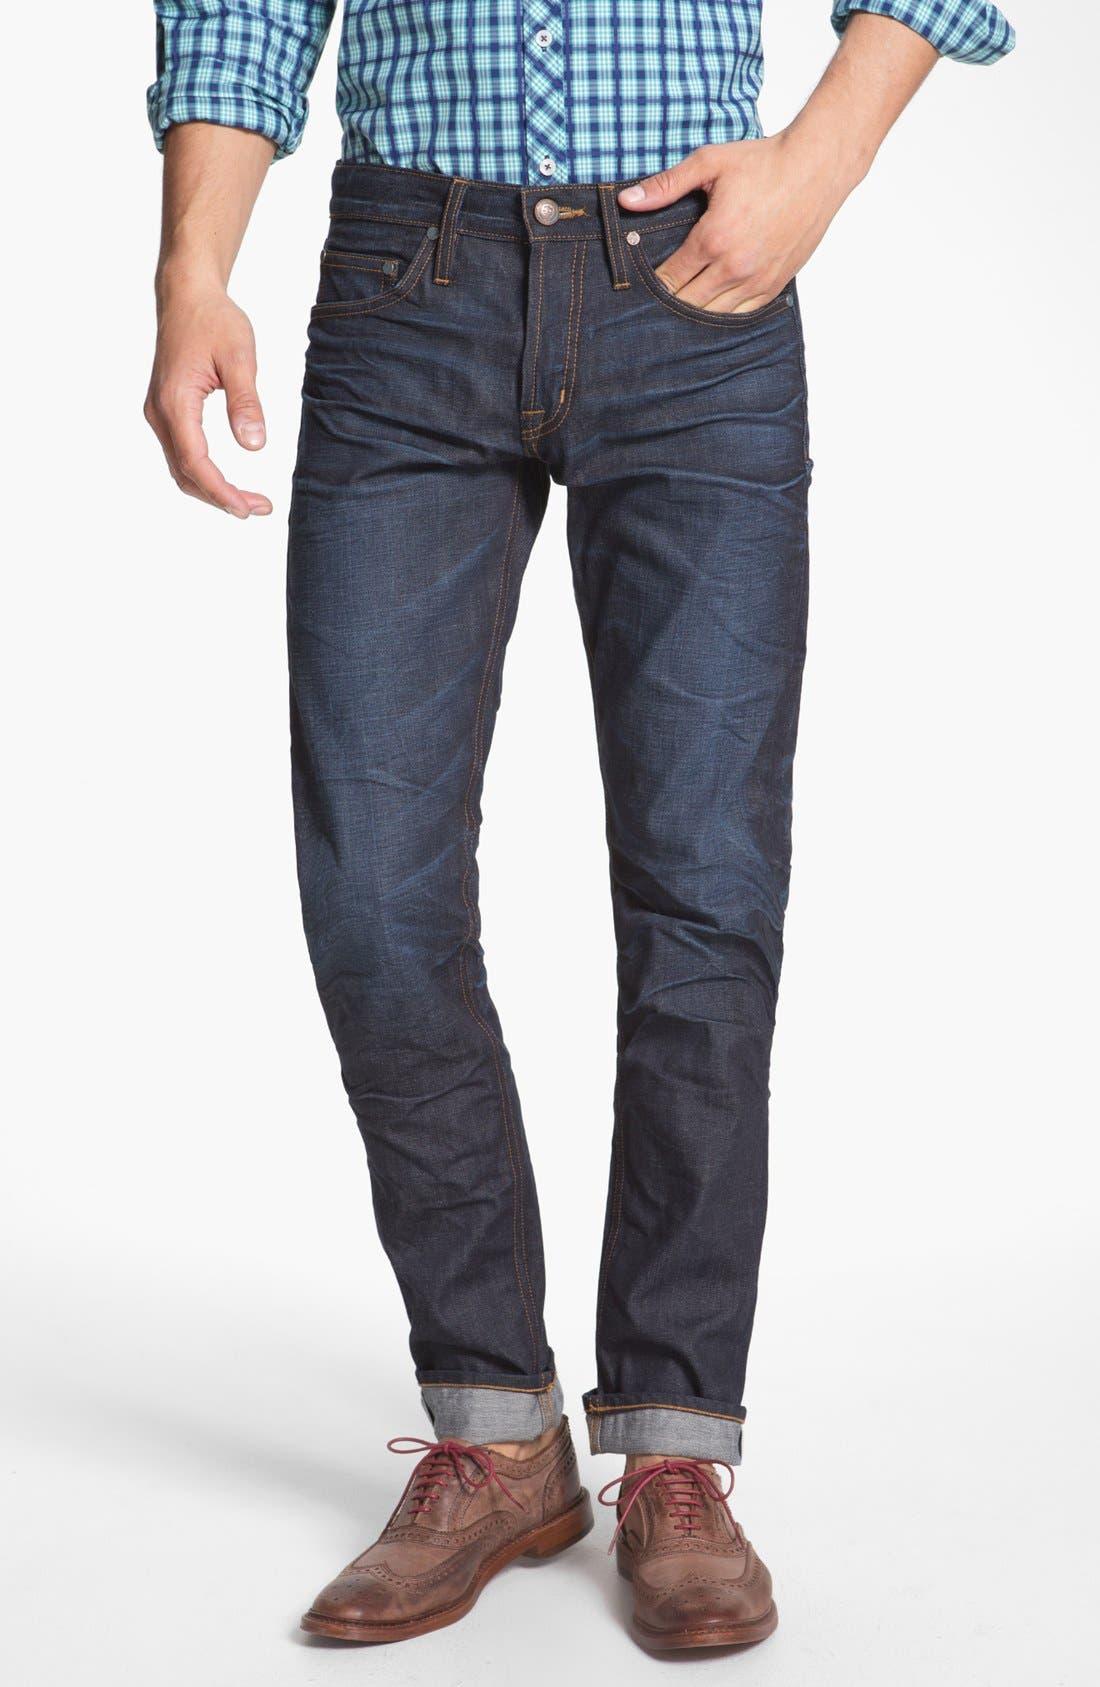 Alternate Image 1 Selected - Asbury Park '1888 Skinny Fit' Raw Selvedge Jeans